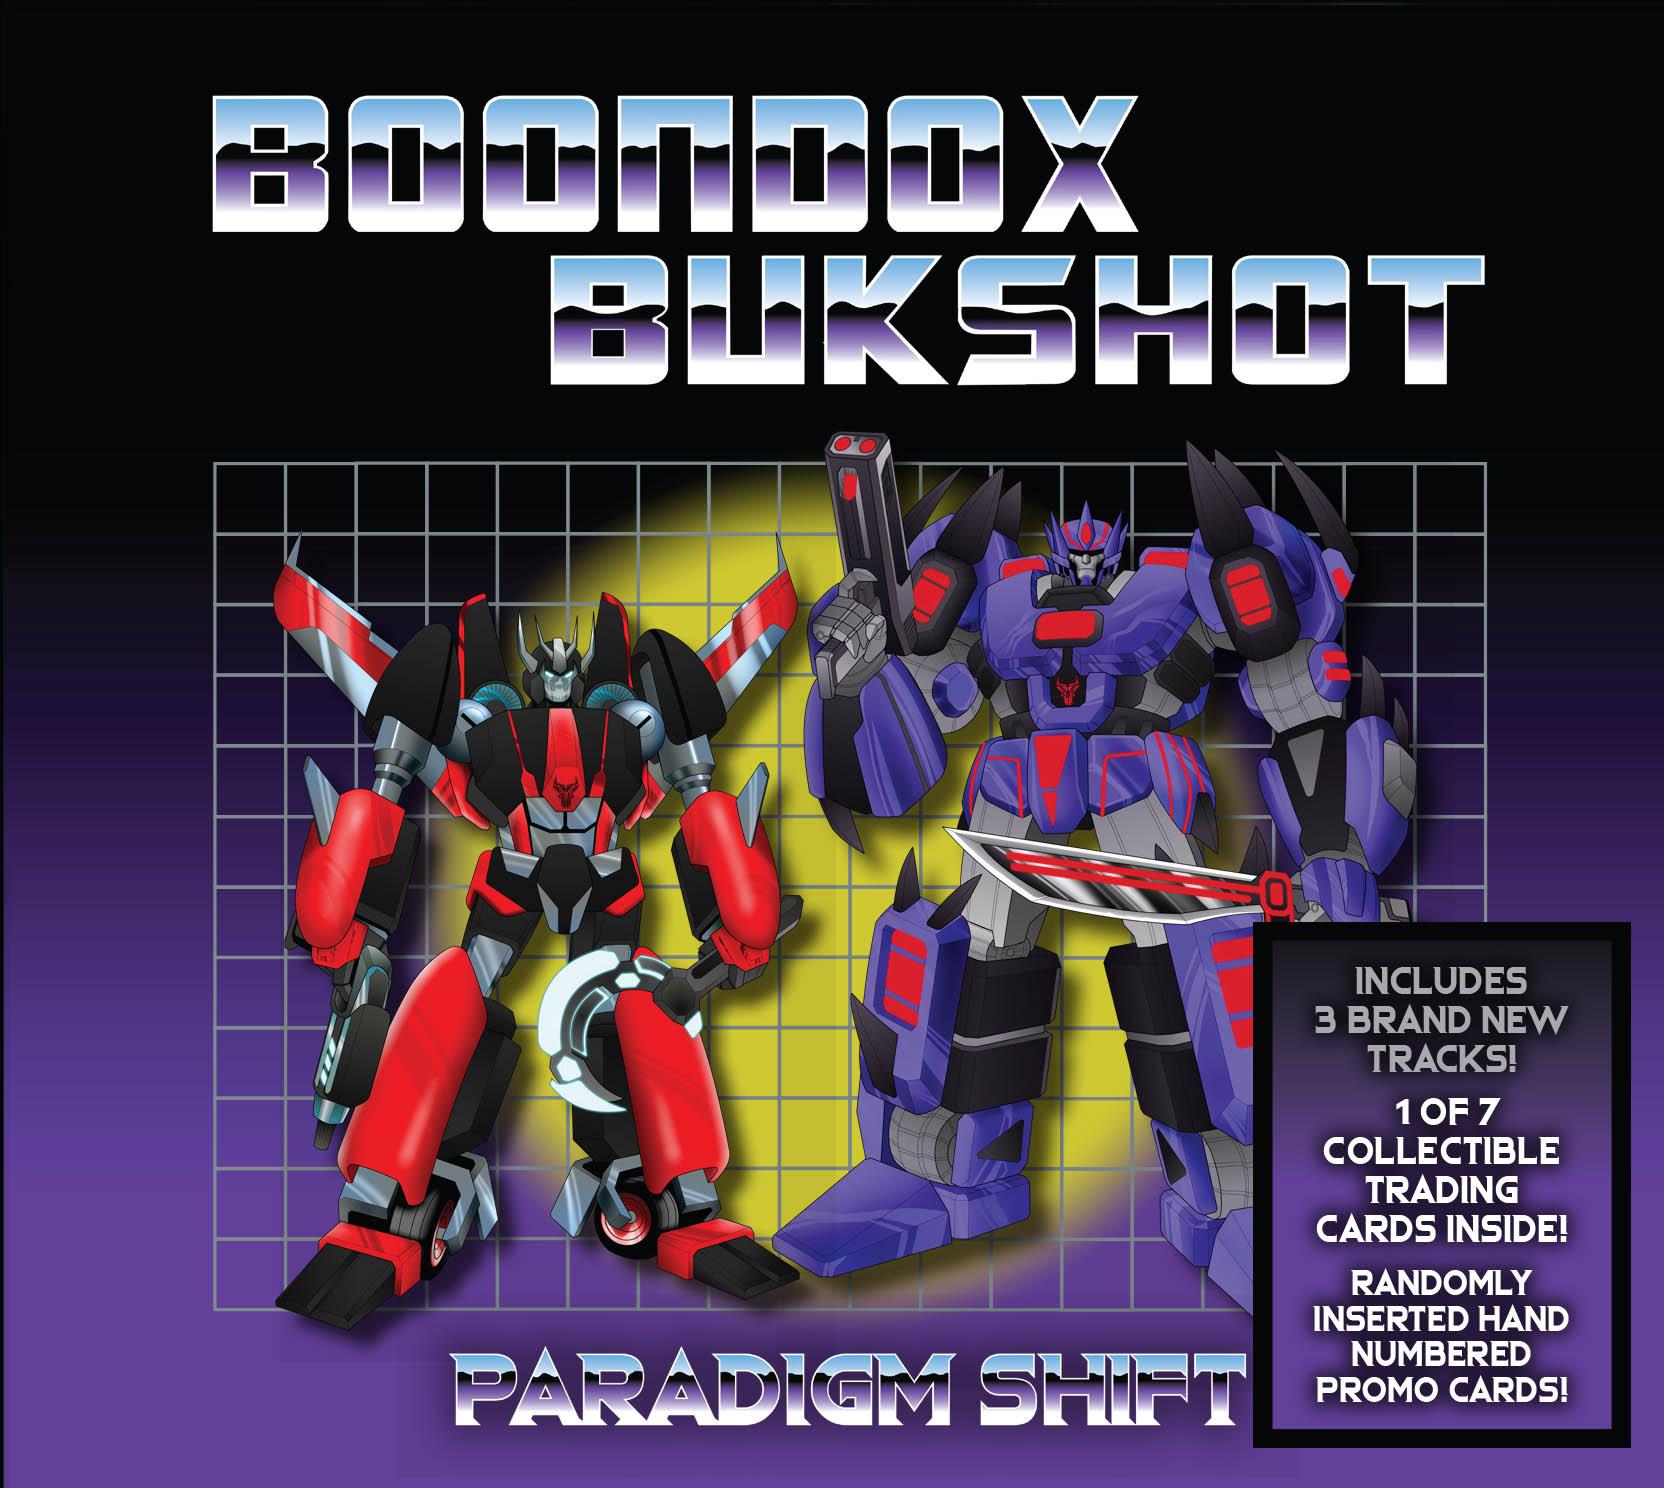 "Boondox X Bukshot ""Paradigm Shift"" CD! (Includes 3 Brand New, Unreleased Tracks!)"